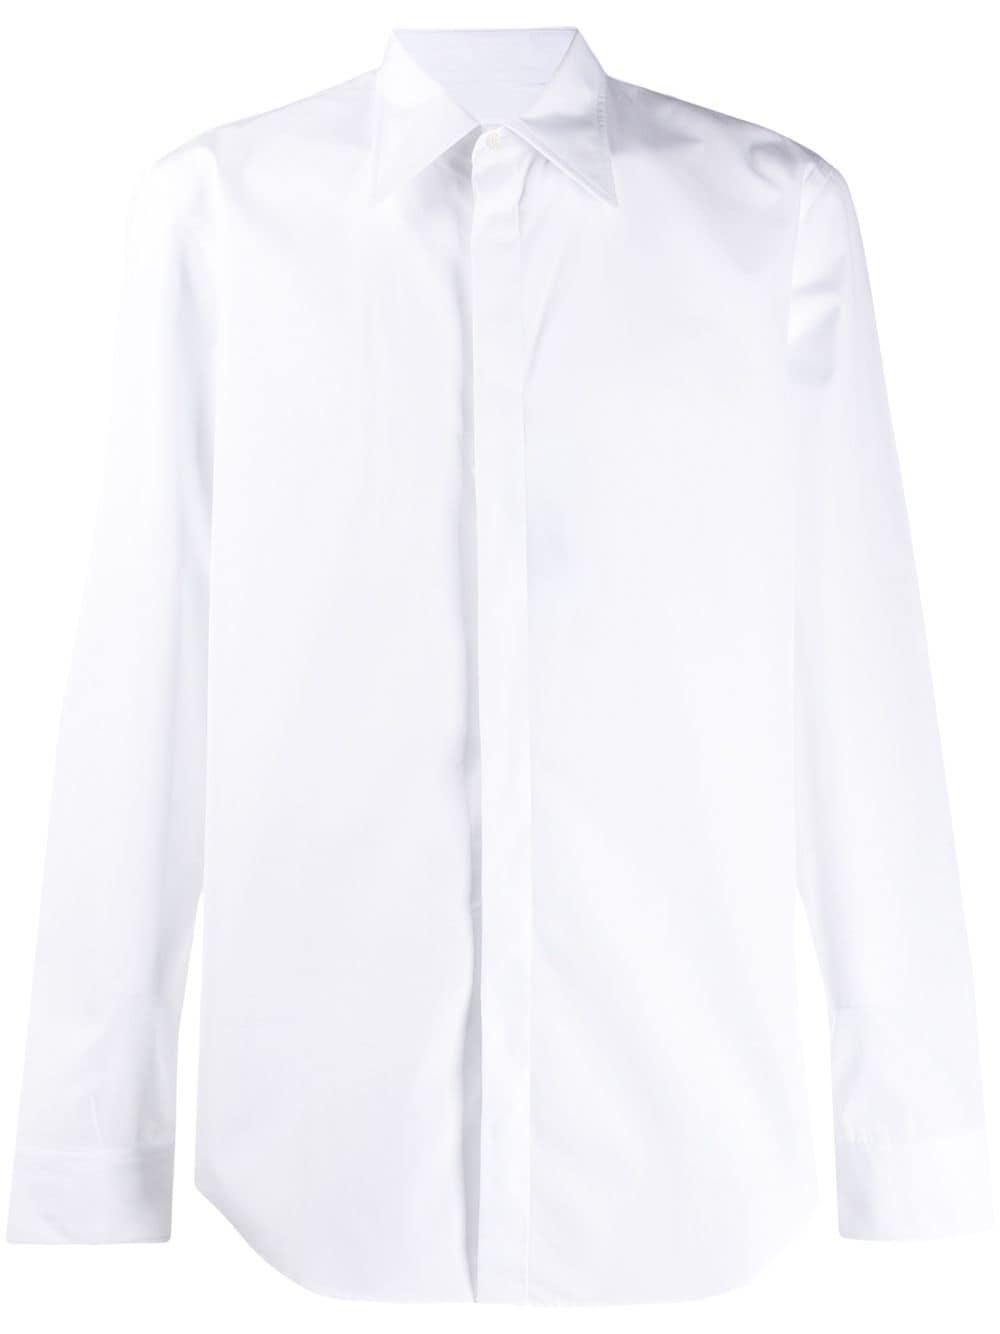 concealed fastening shirt man white in cotton MAISON MARGIELA | Shirts | S50DL0435 S43001100